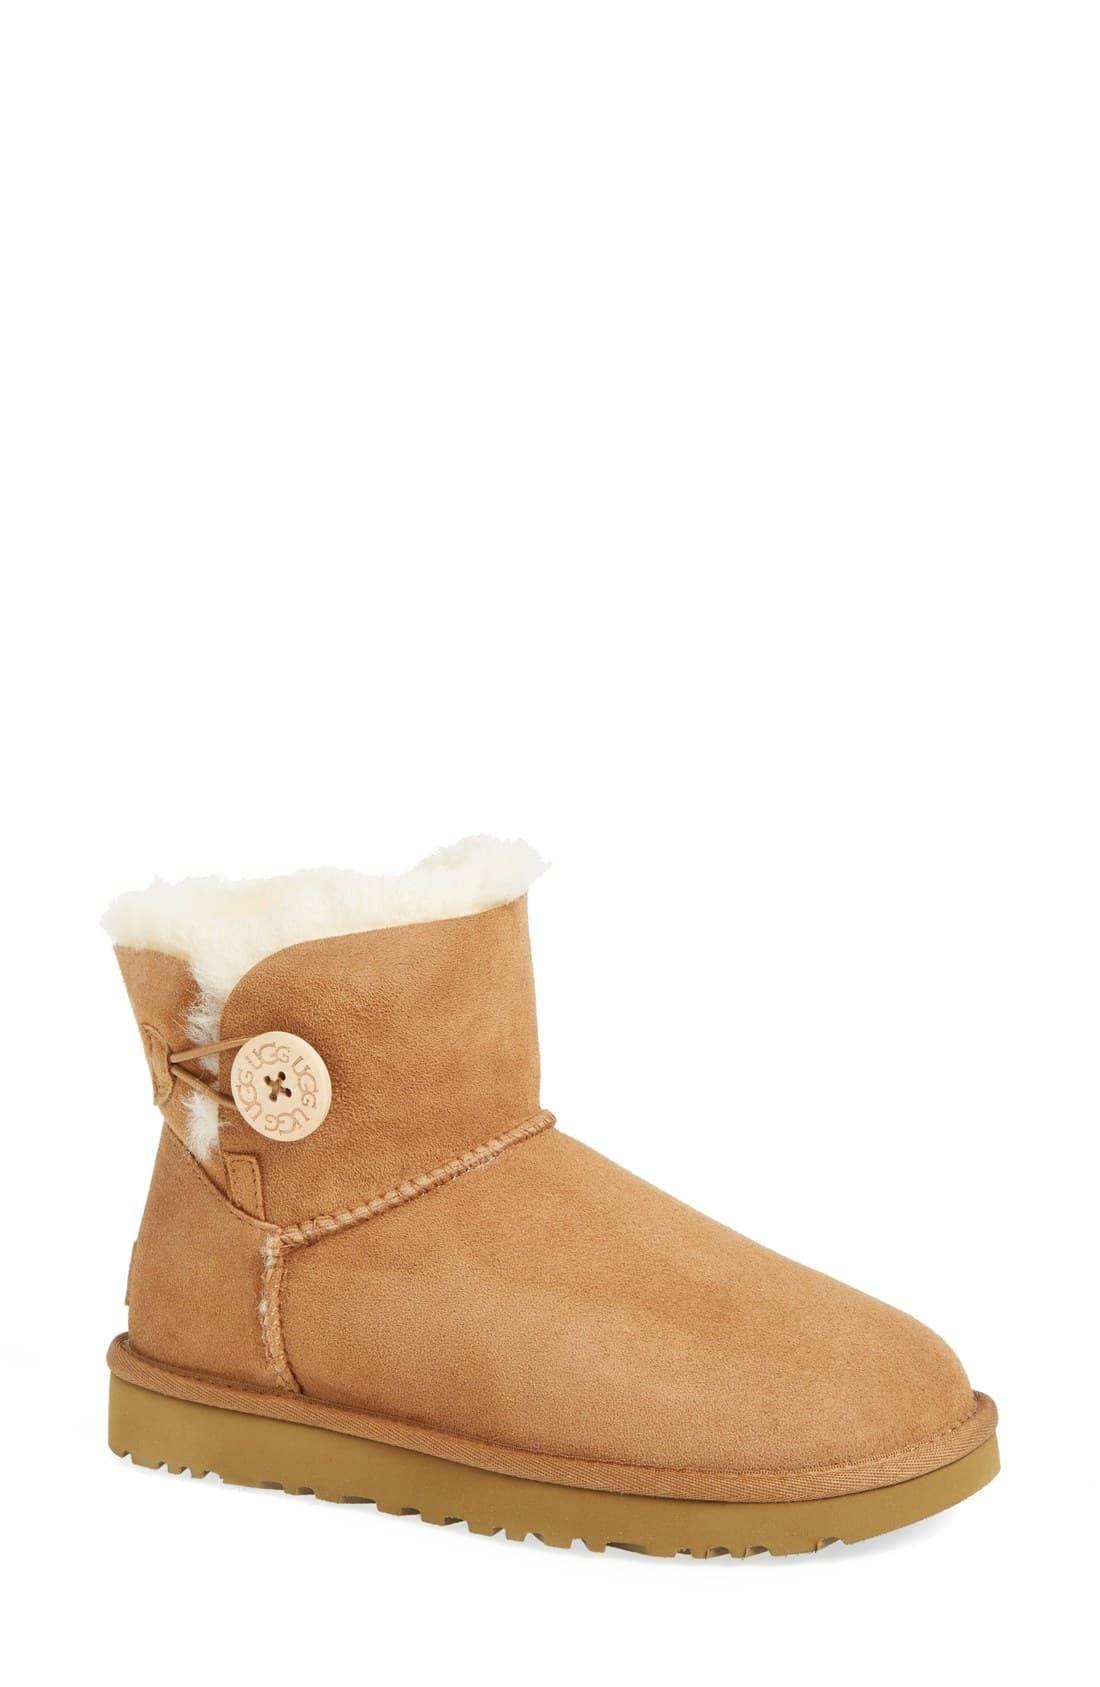 408063d2acc Women's Ugg Mini Bailey Button Ii Genuine Shearling Boot, Size 5 M ...